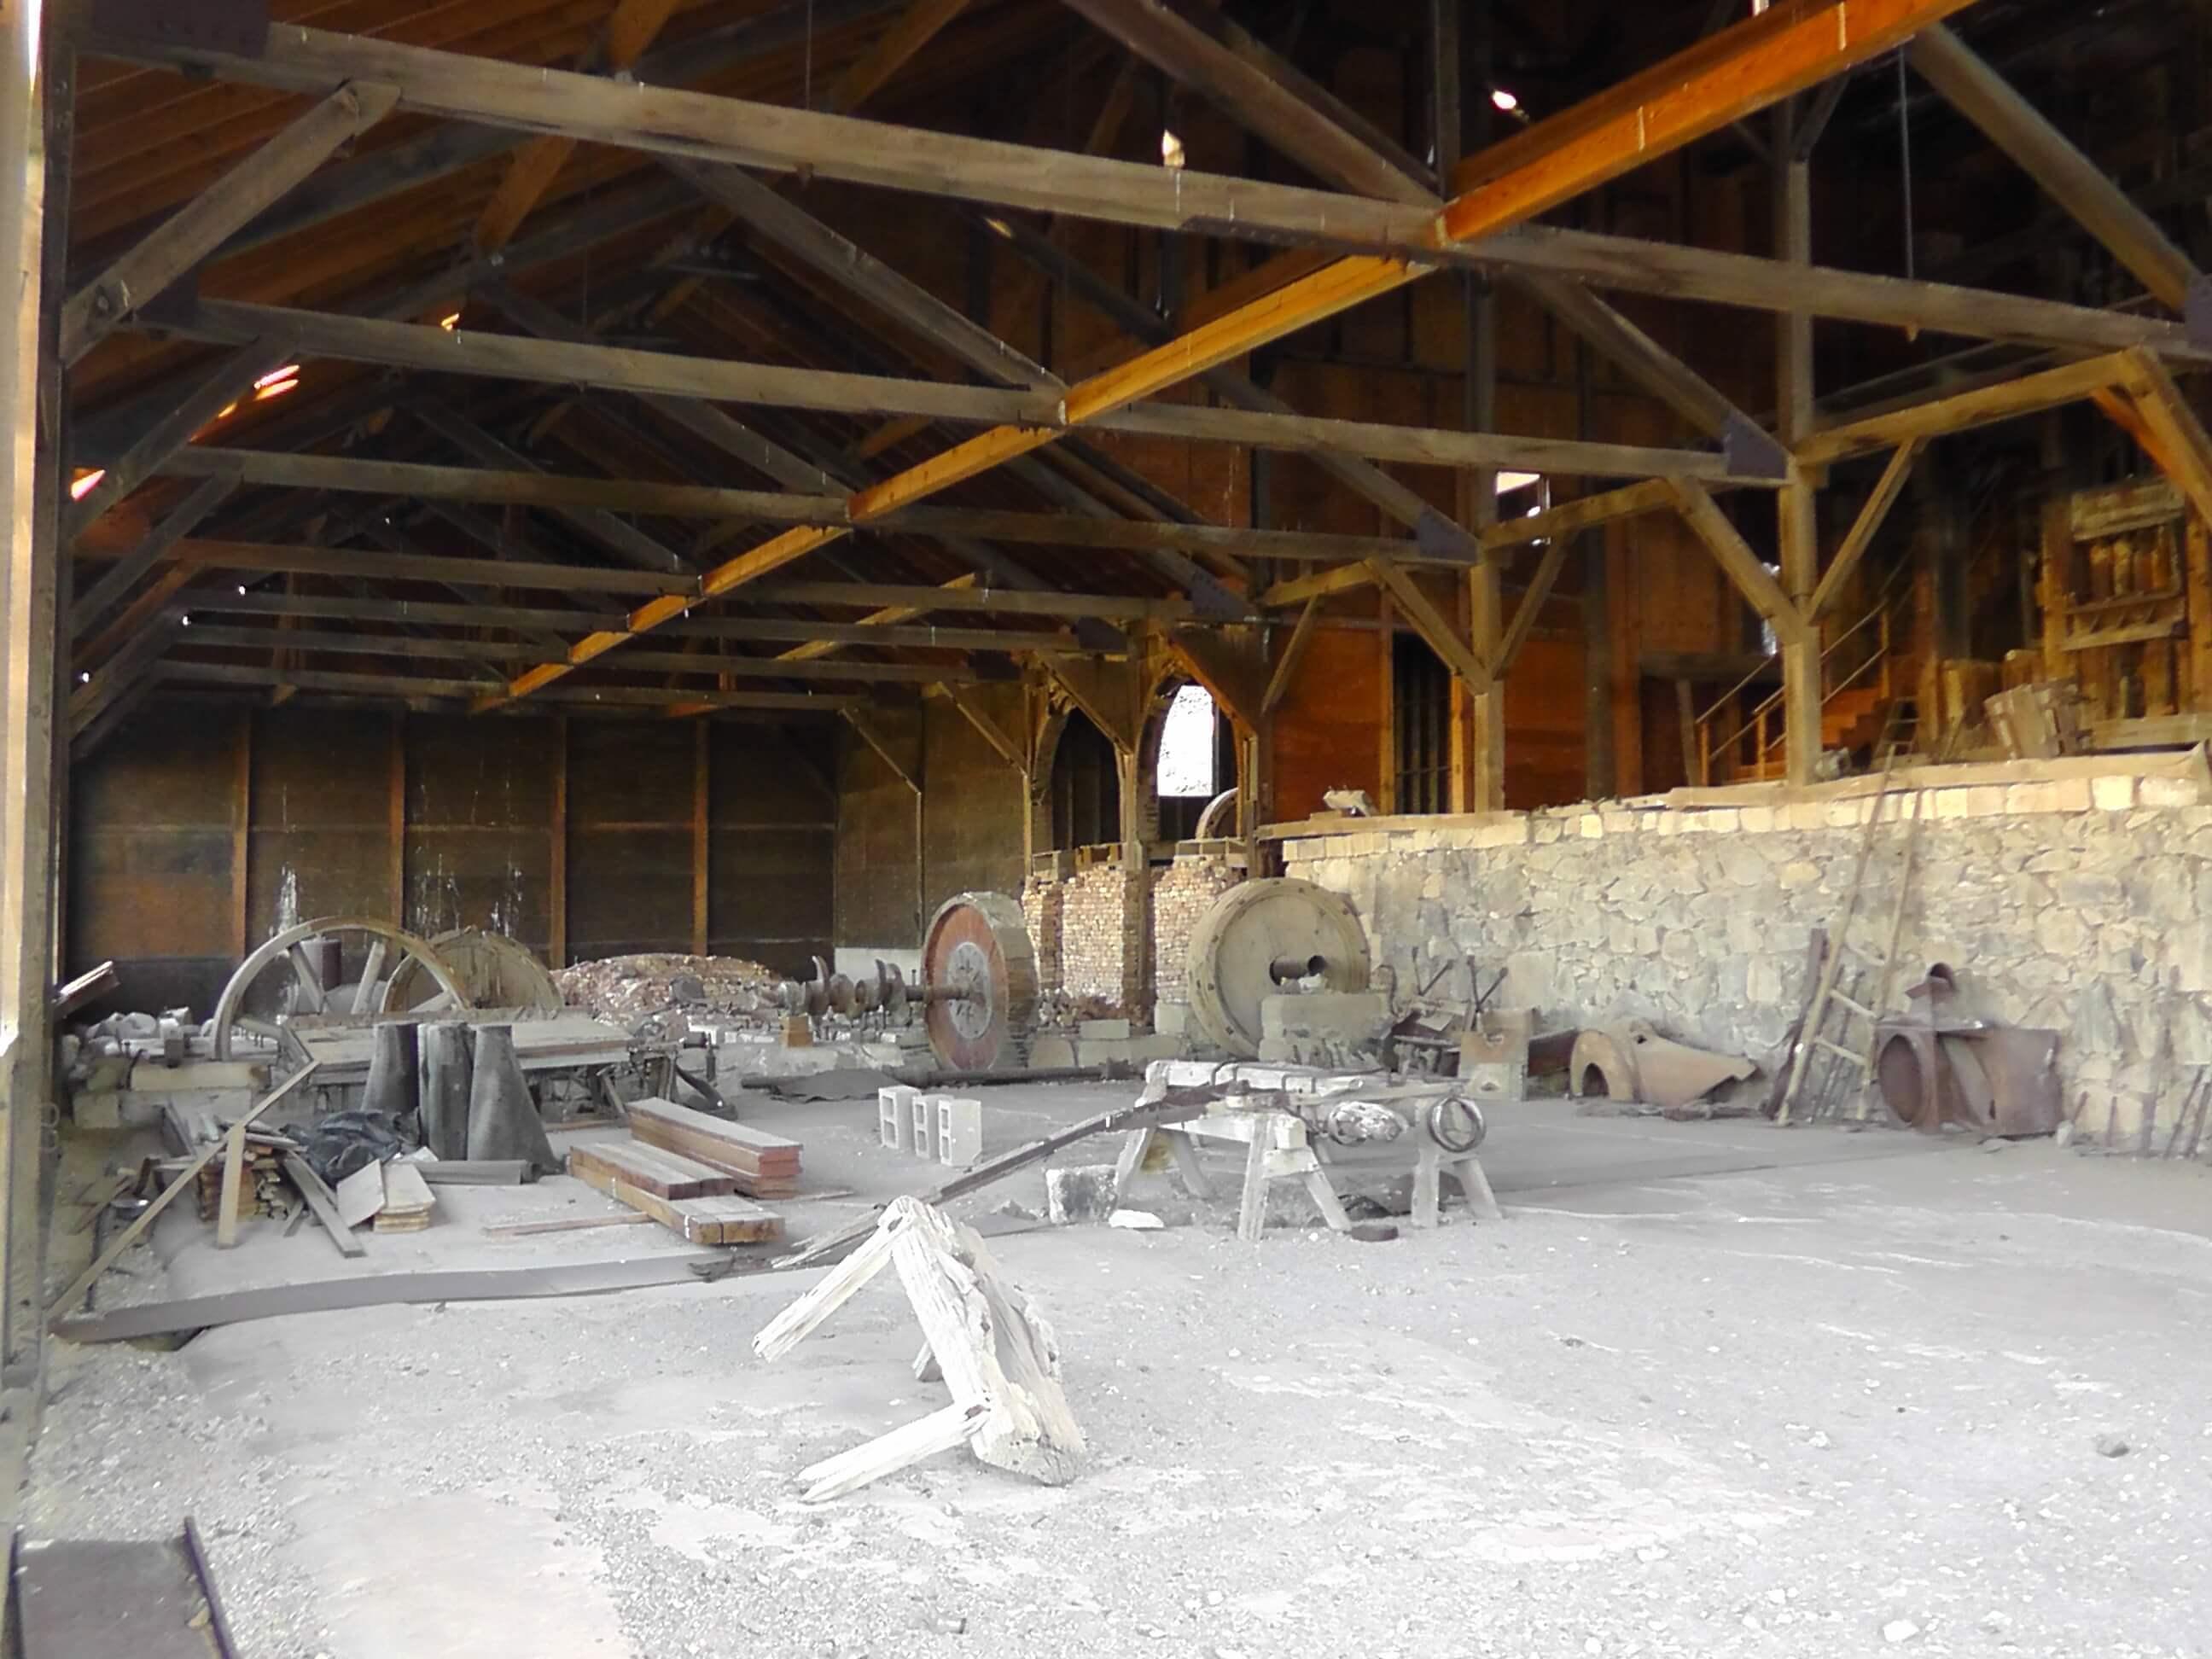 Berlin Ghost Town, Berlin/Ichthyosaur State Park, Nevada